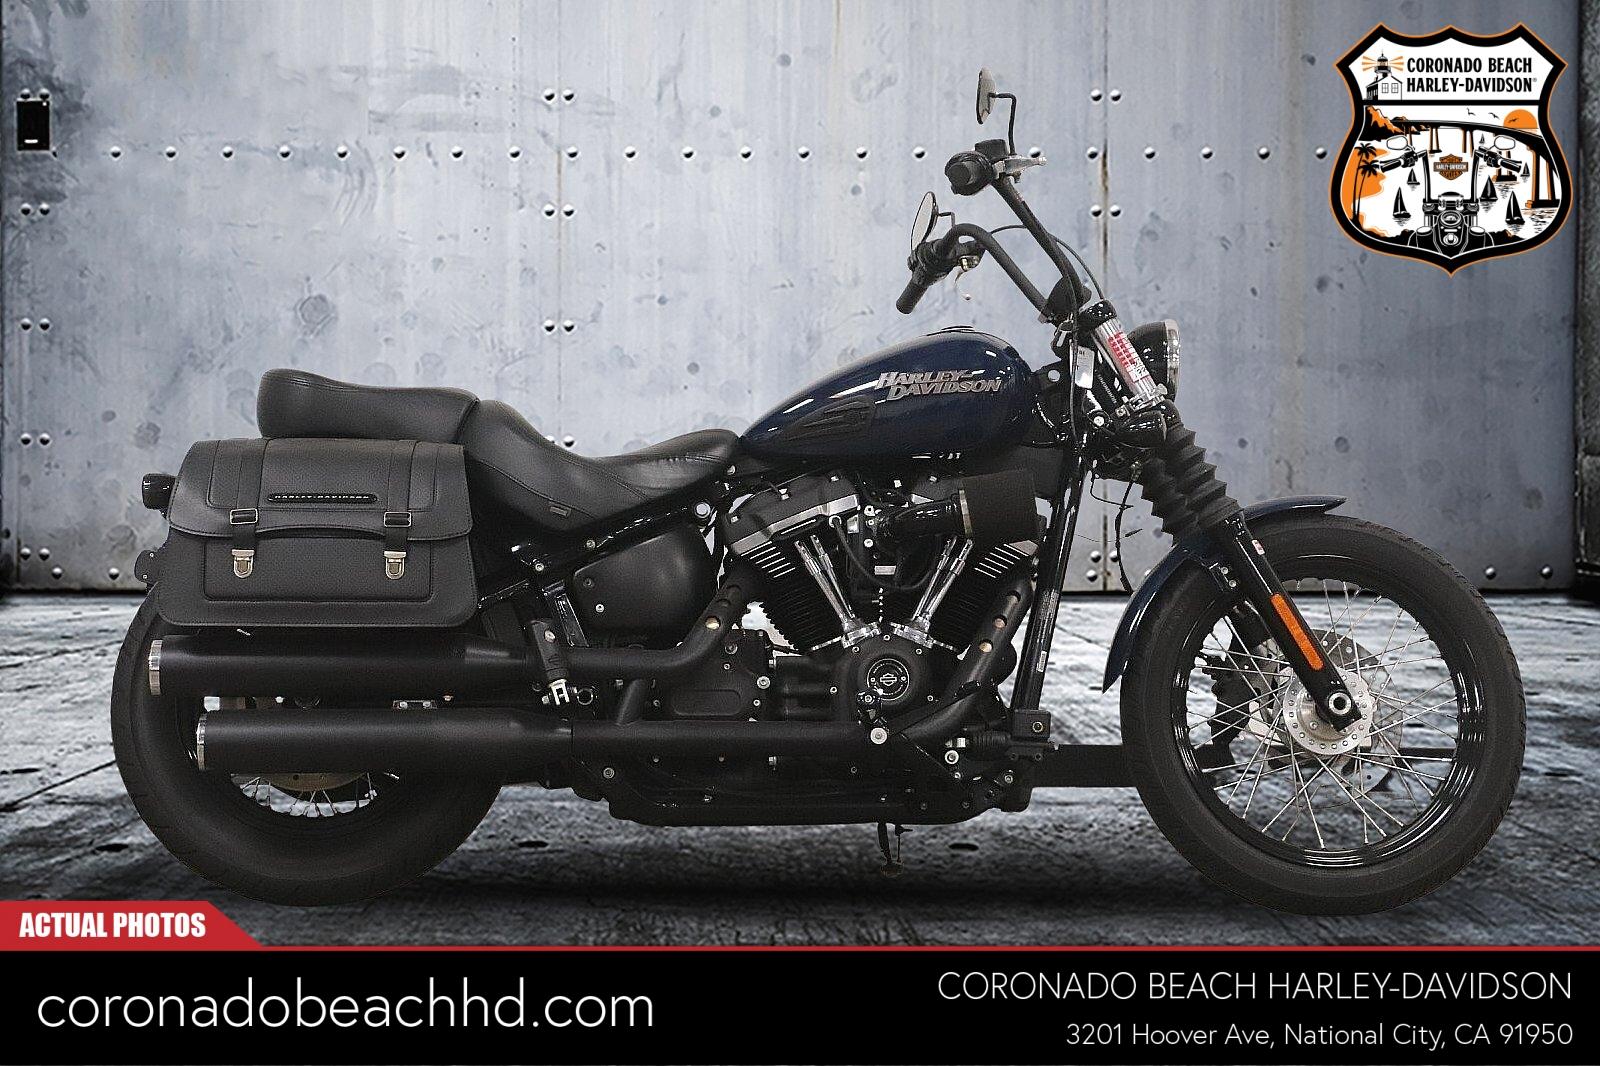 2019 Harley-Davidson Street Bob [81]